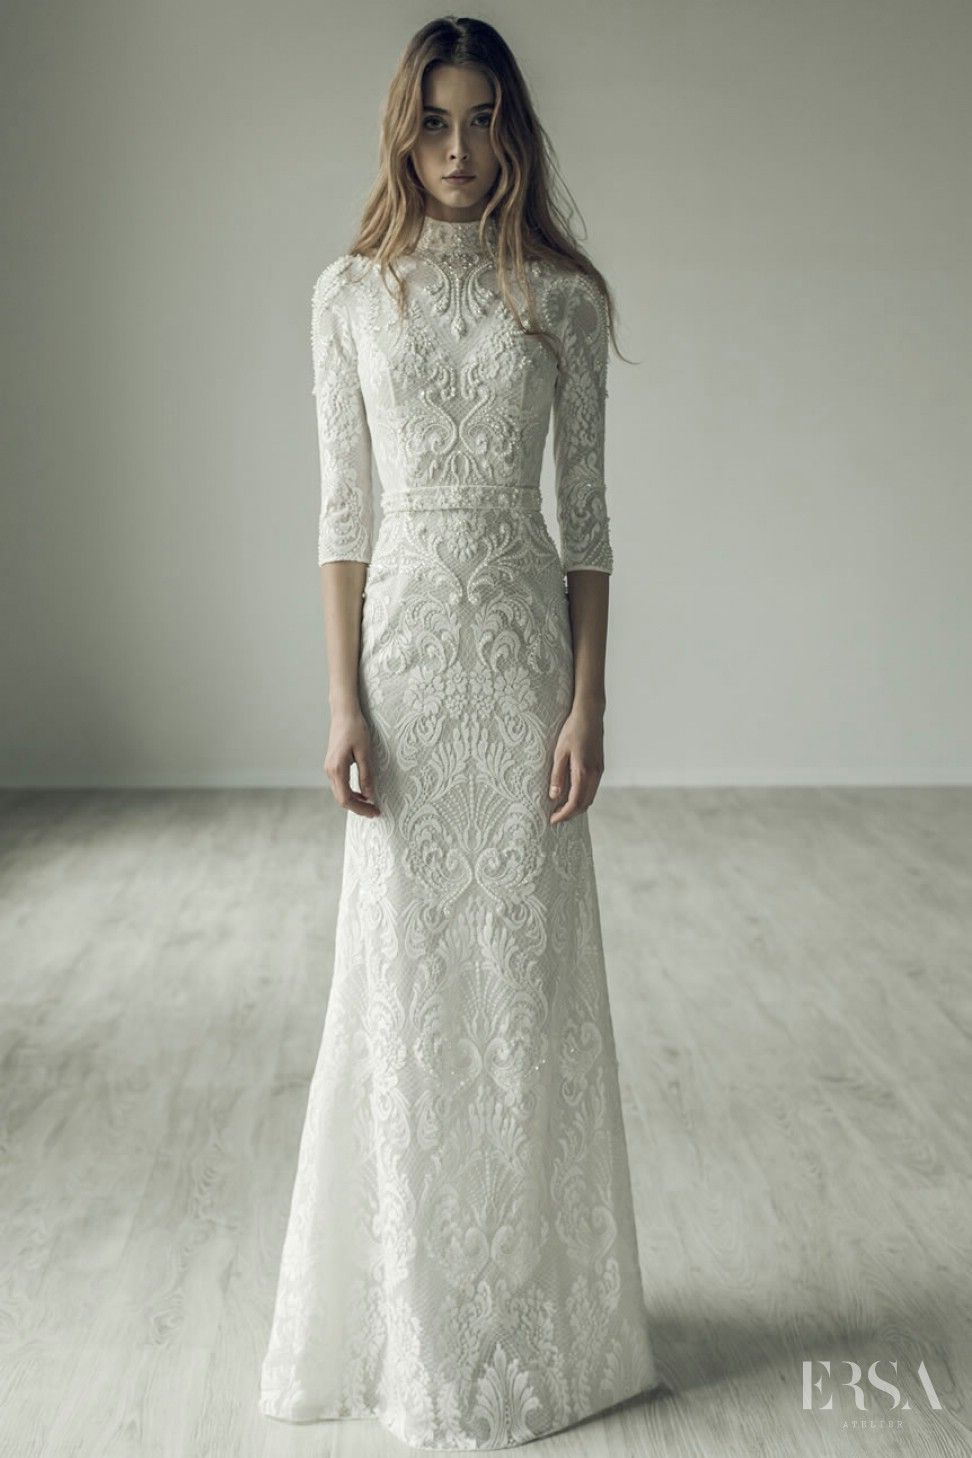 Ersa Atelier Wedding Collection Dress Rochii De Mireasa